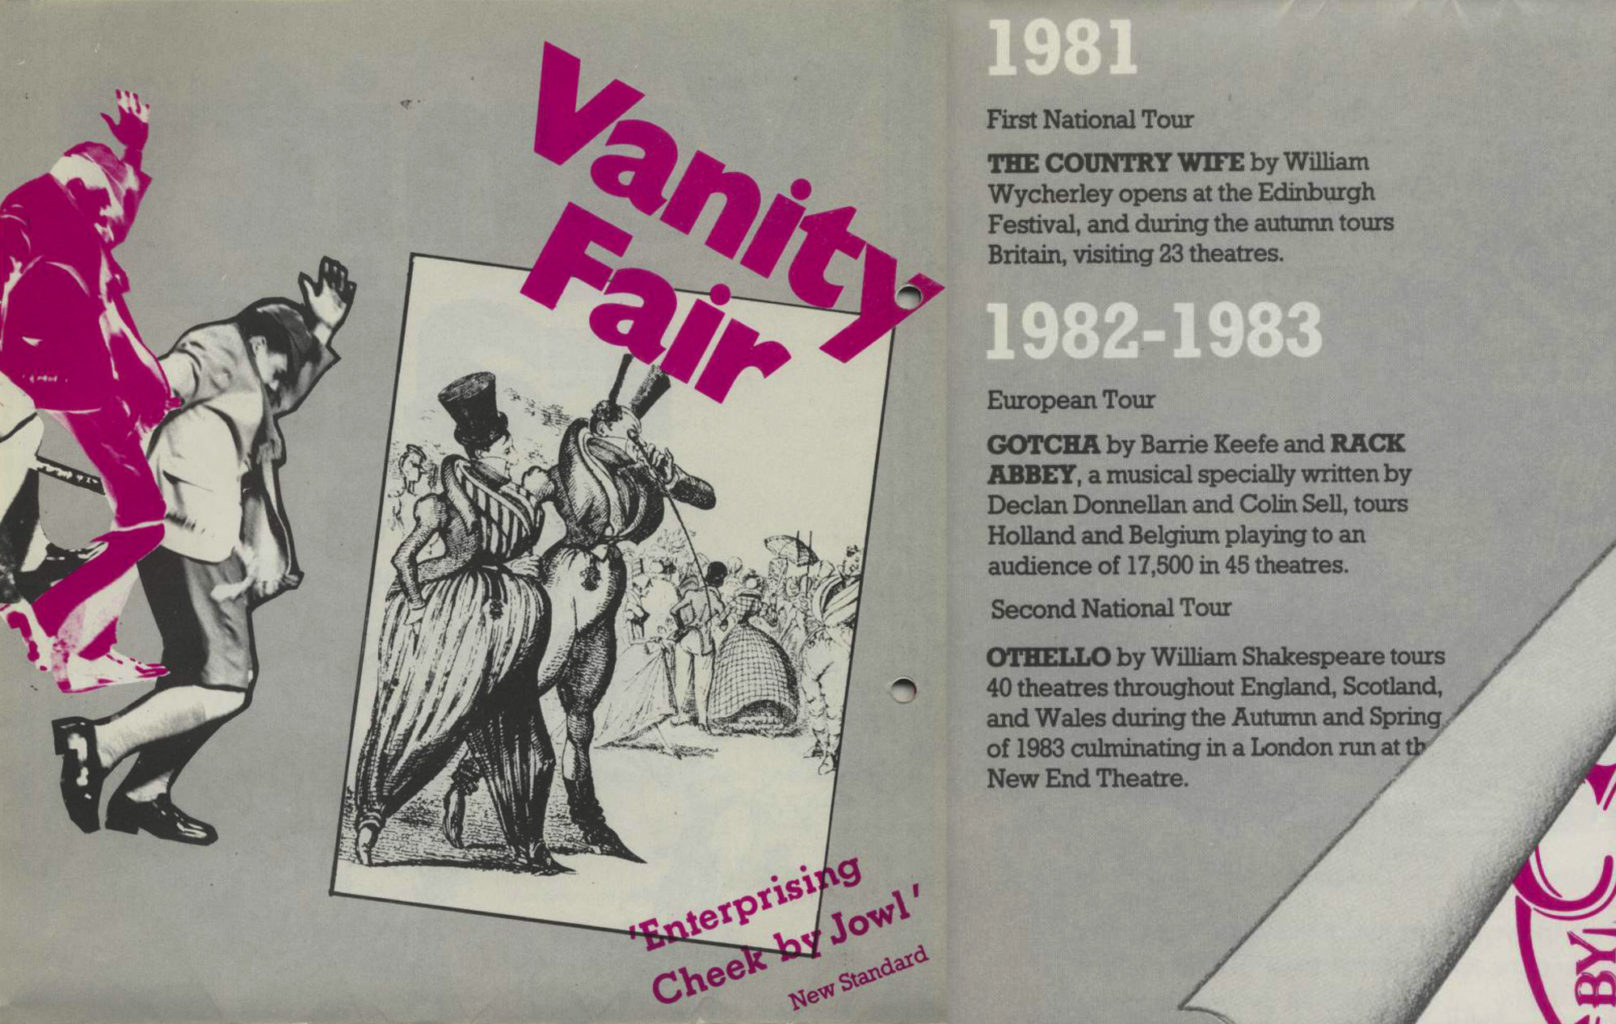 Programme for Cheek by Jowl's Vanity Fair (version 1)